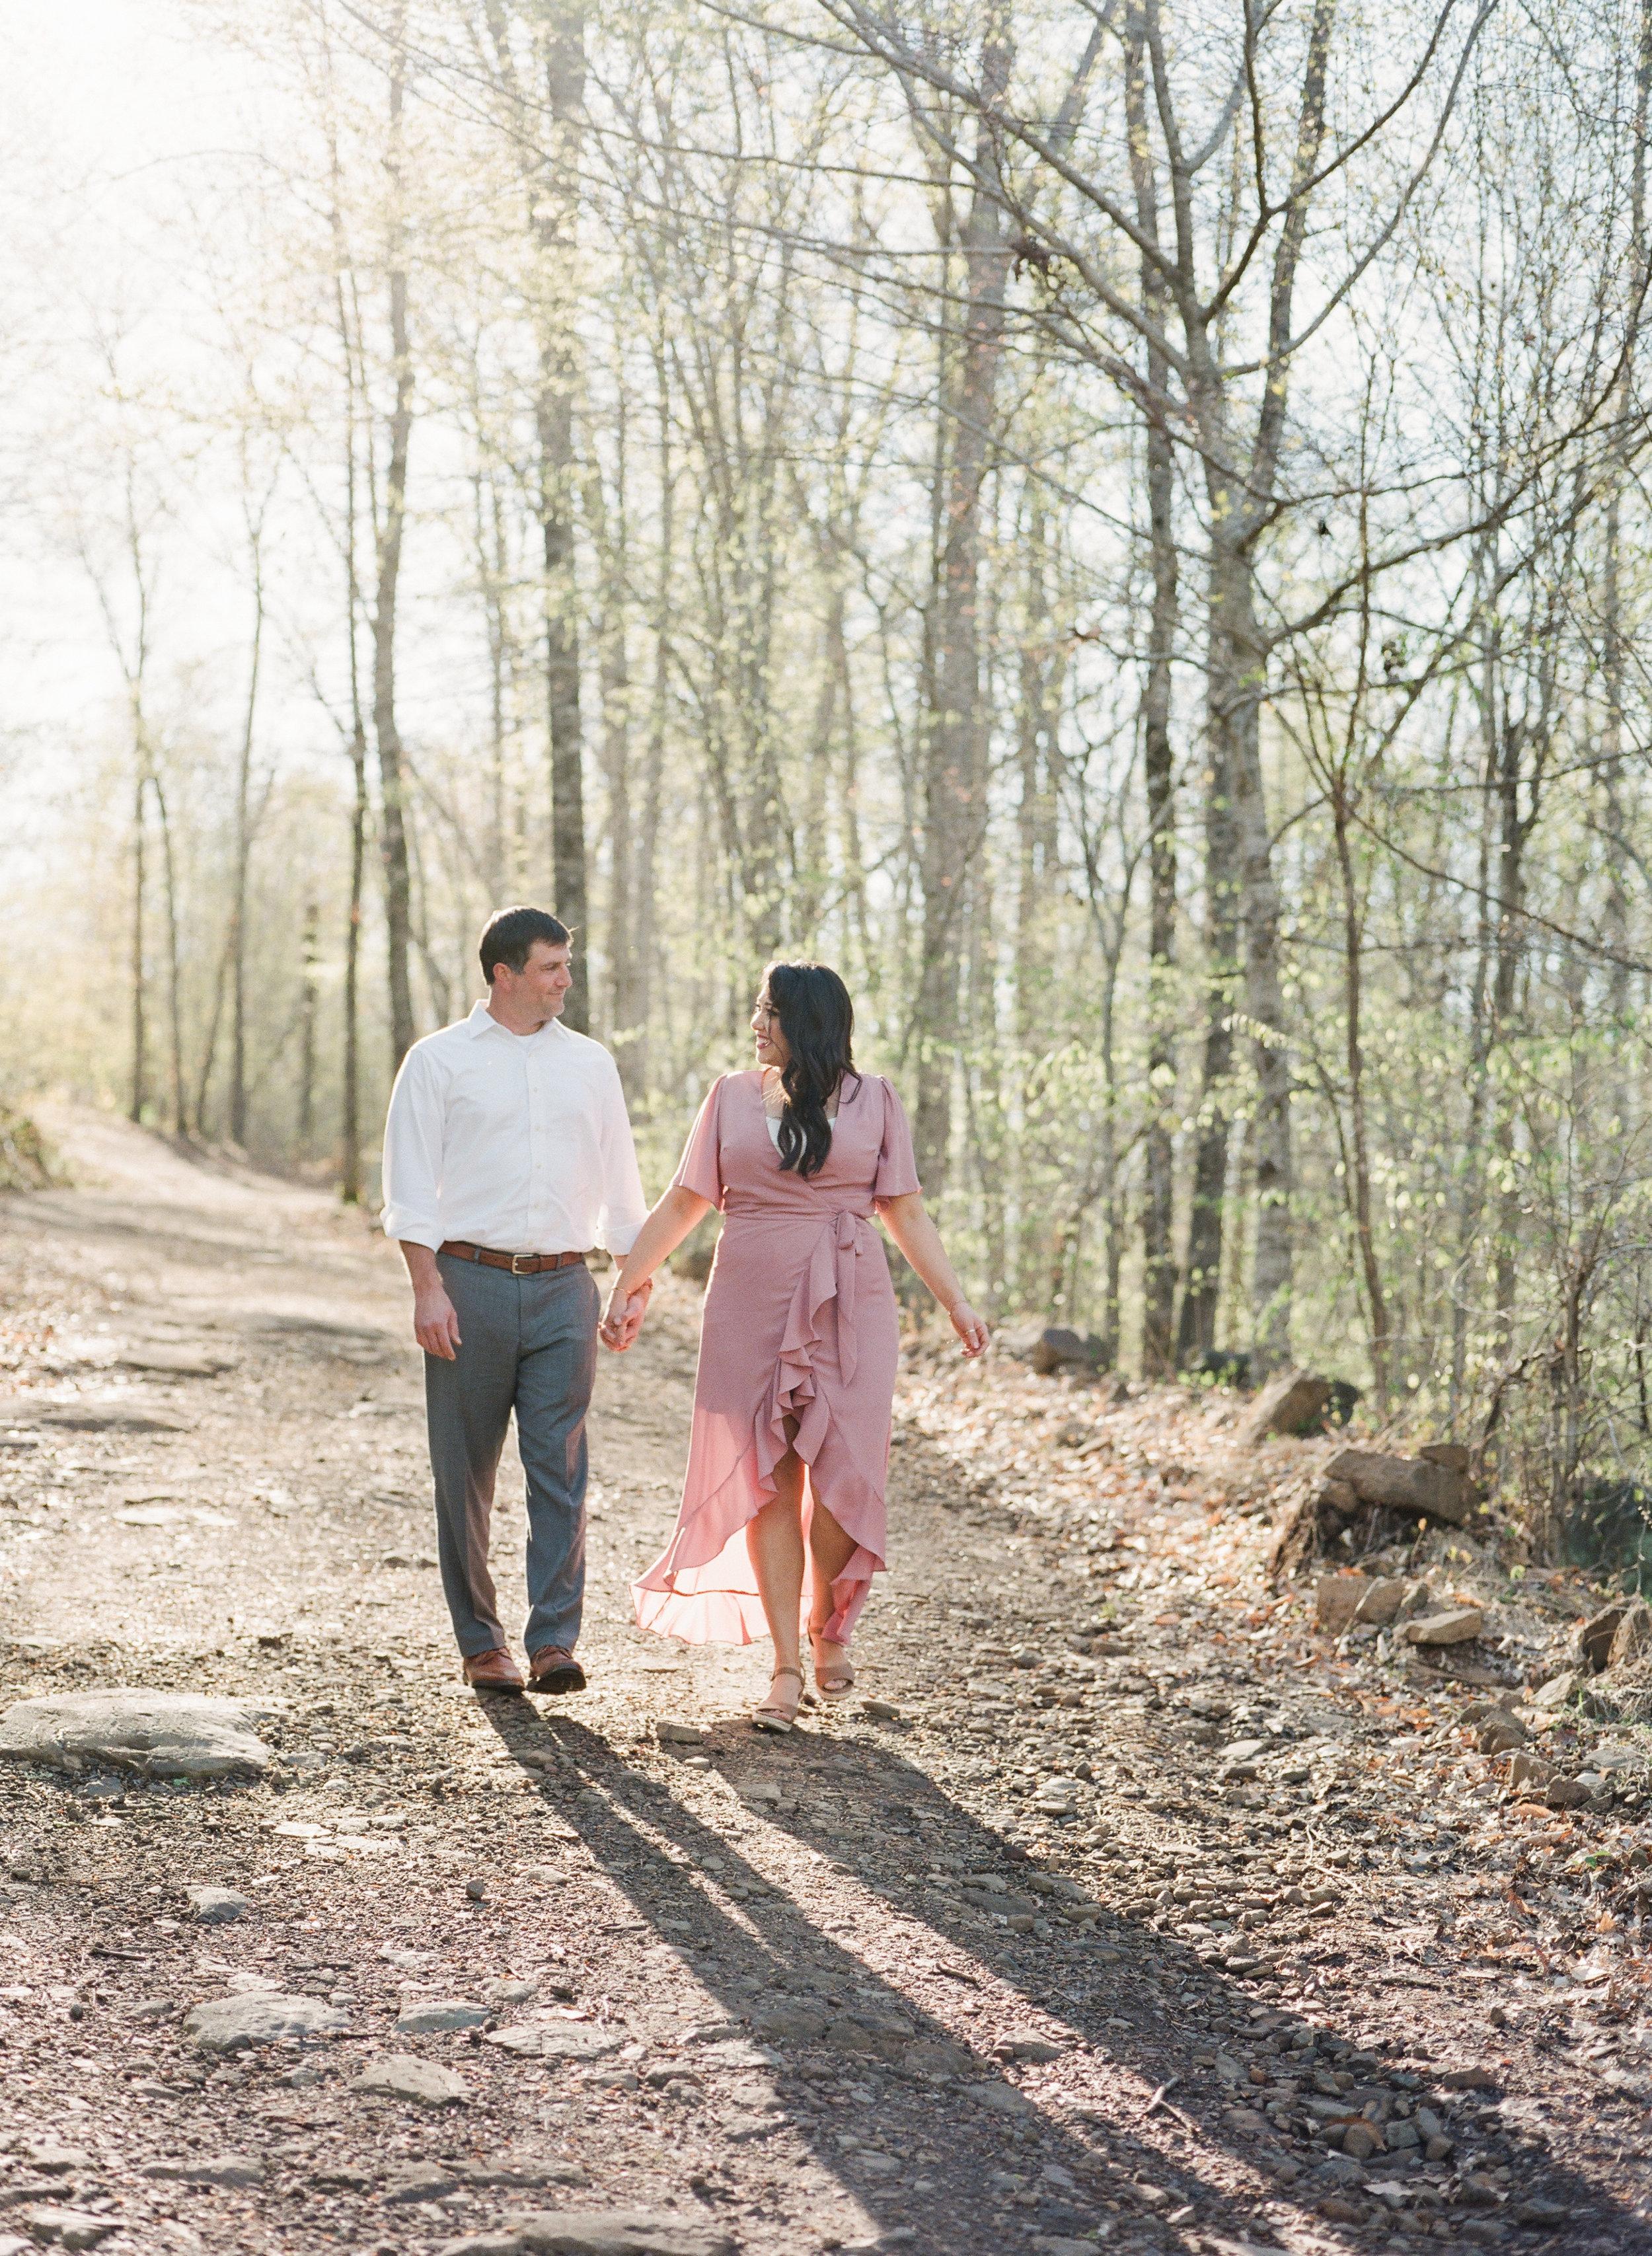 Woodsy Arkansas Engagement Session by Arkansas Wedding Photographer Natalie Smith Photography